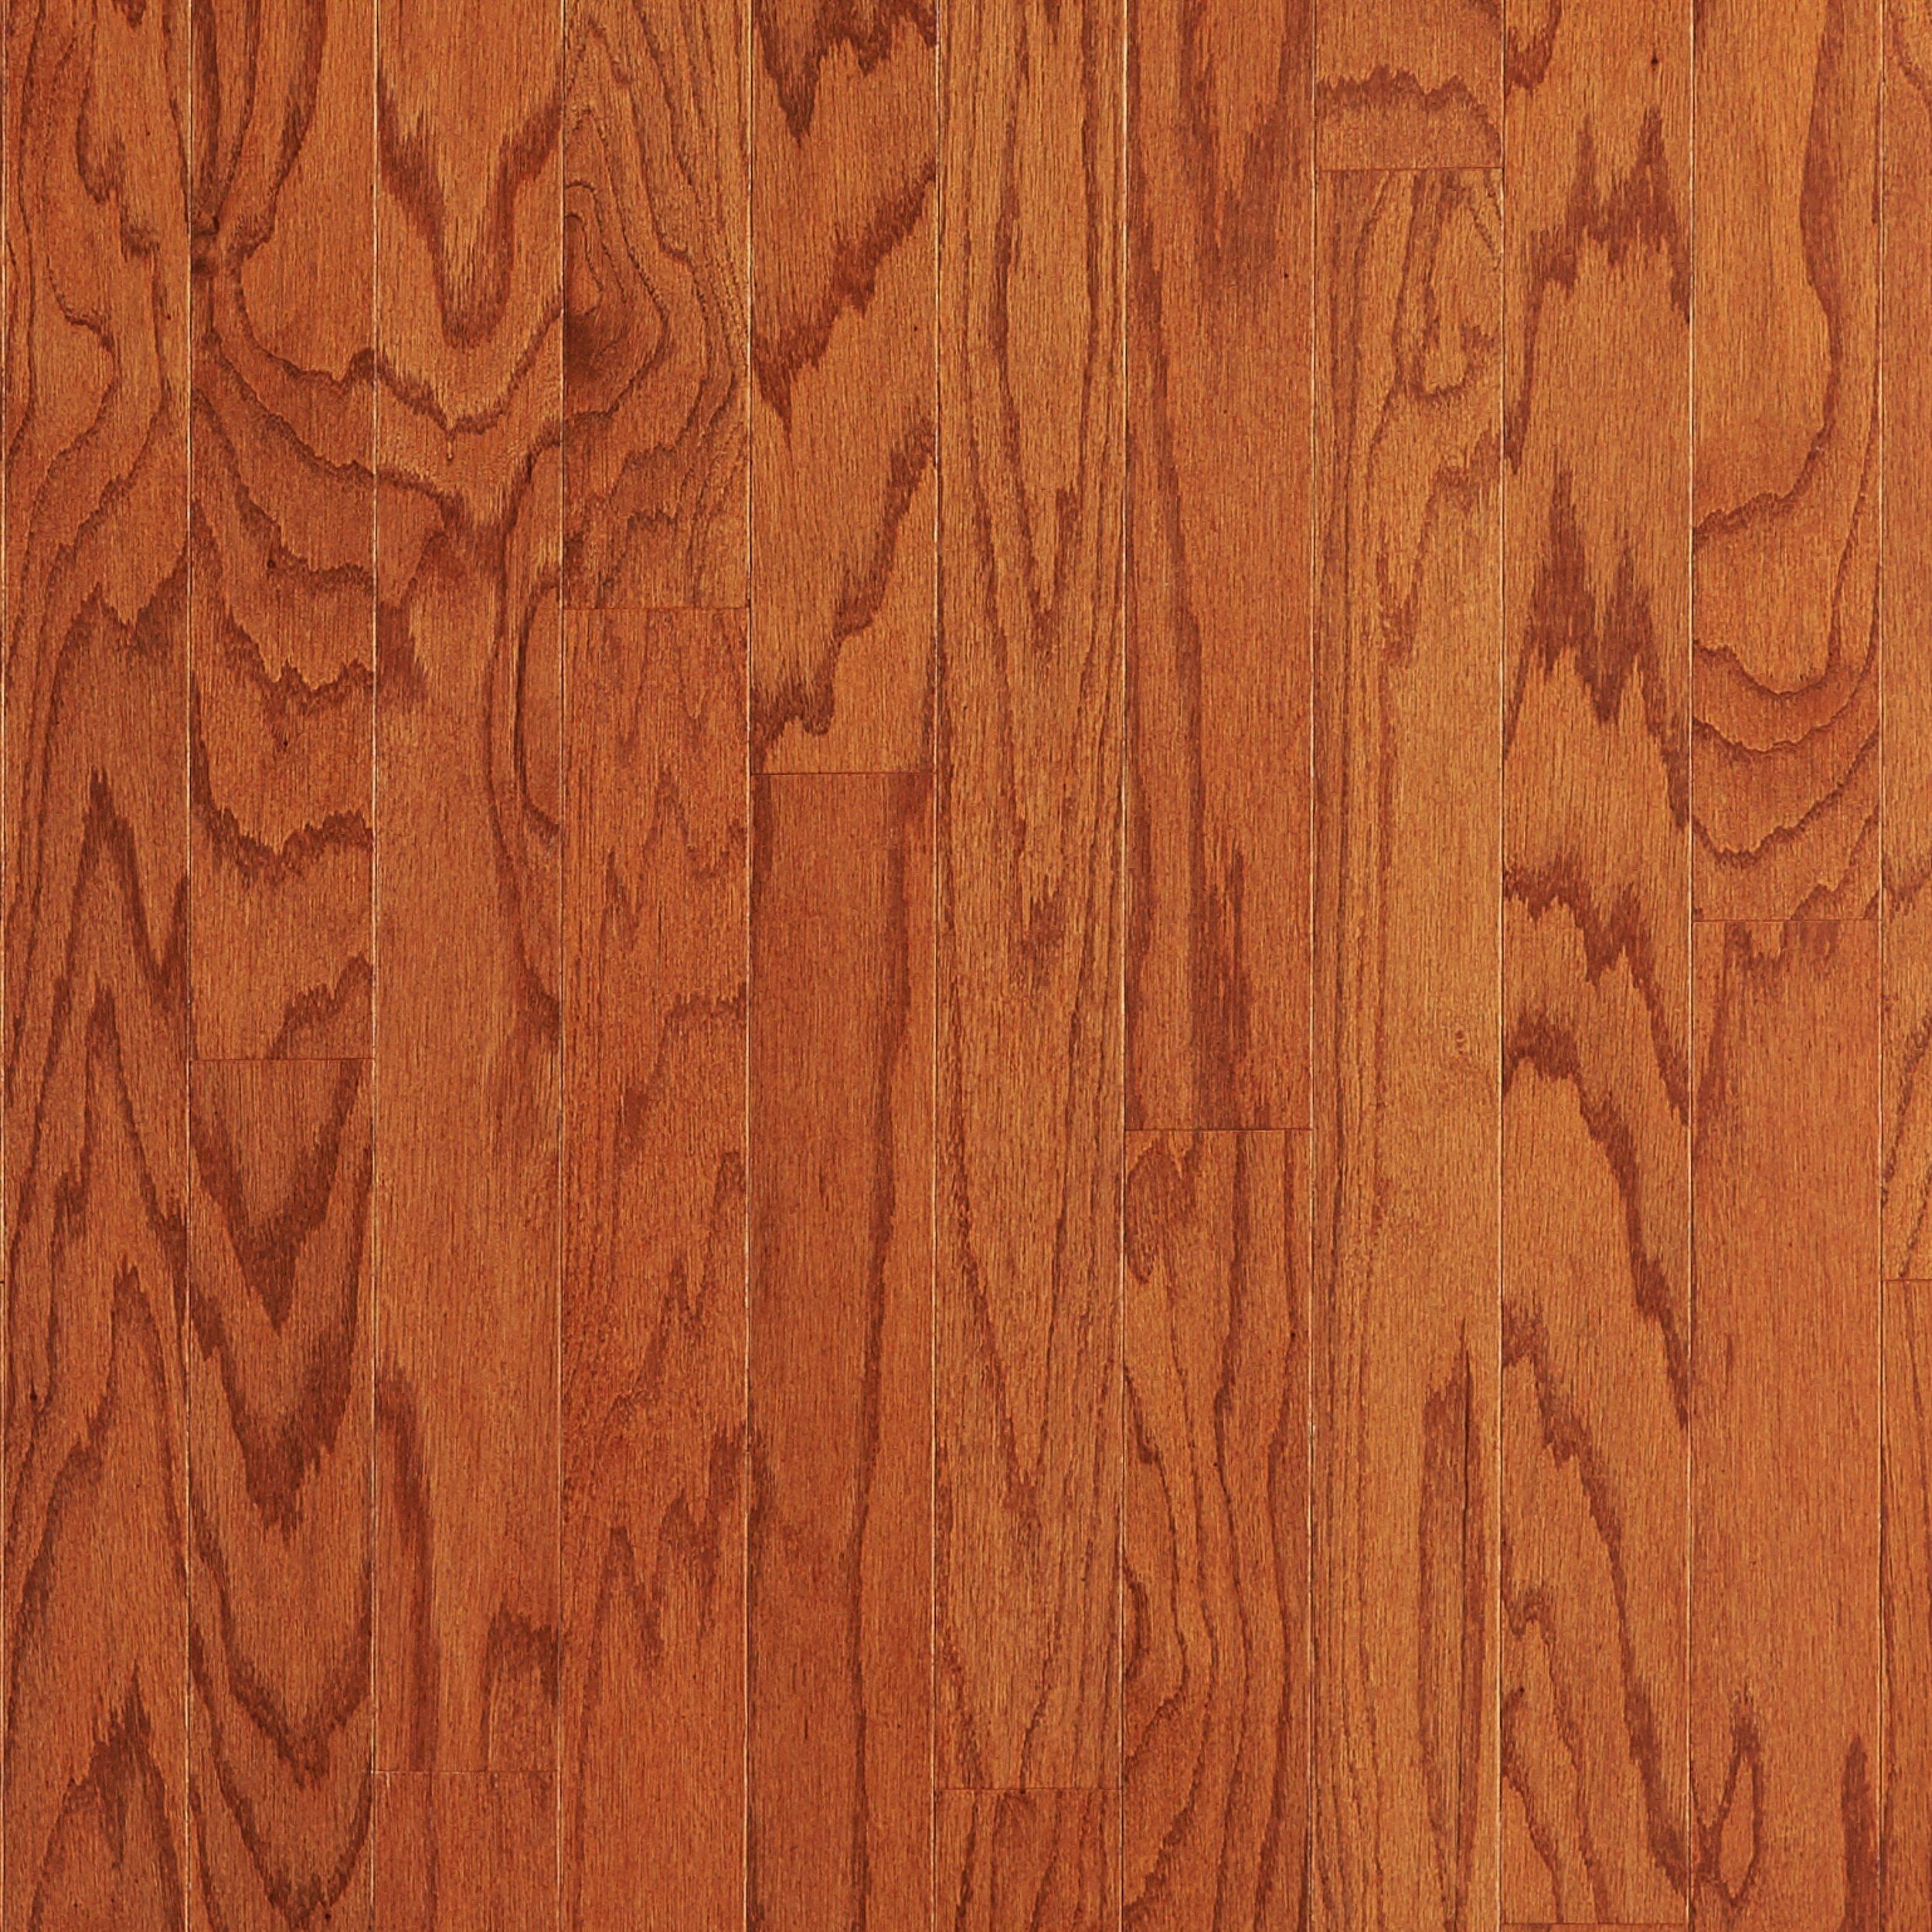 Gunstock Oak Engineered Hardwood Floor Decor In 2020 Engineered Hardwood Flooring Hardwood